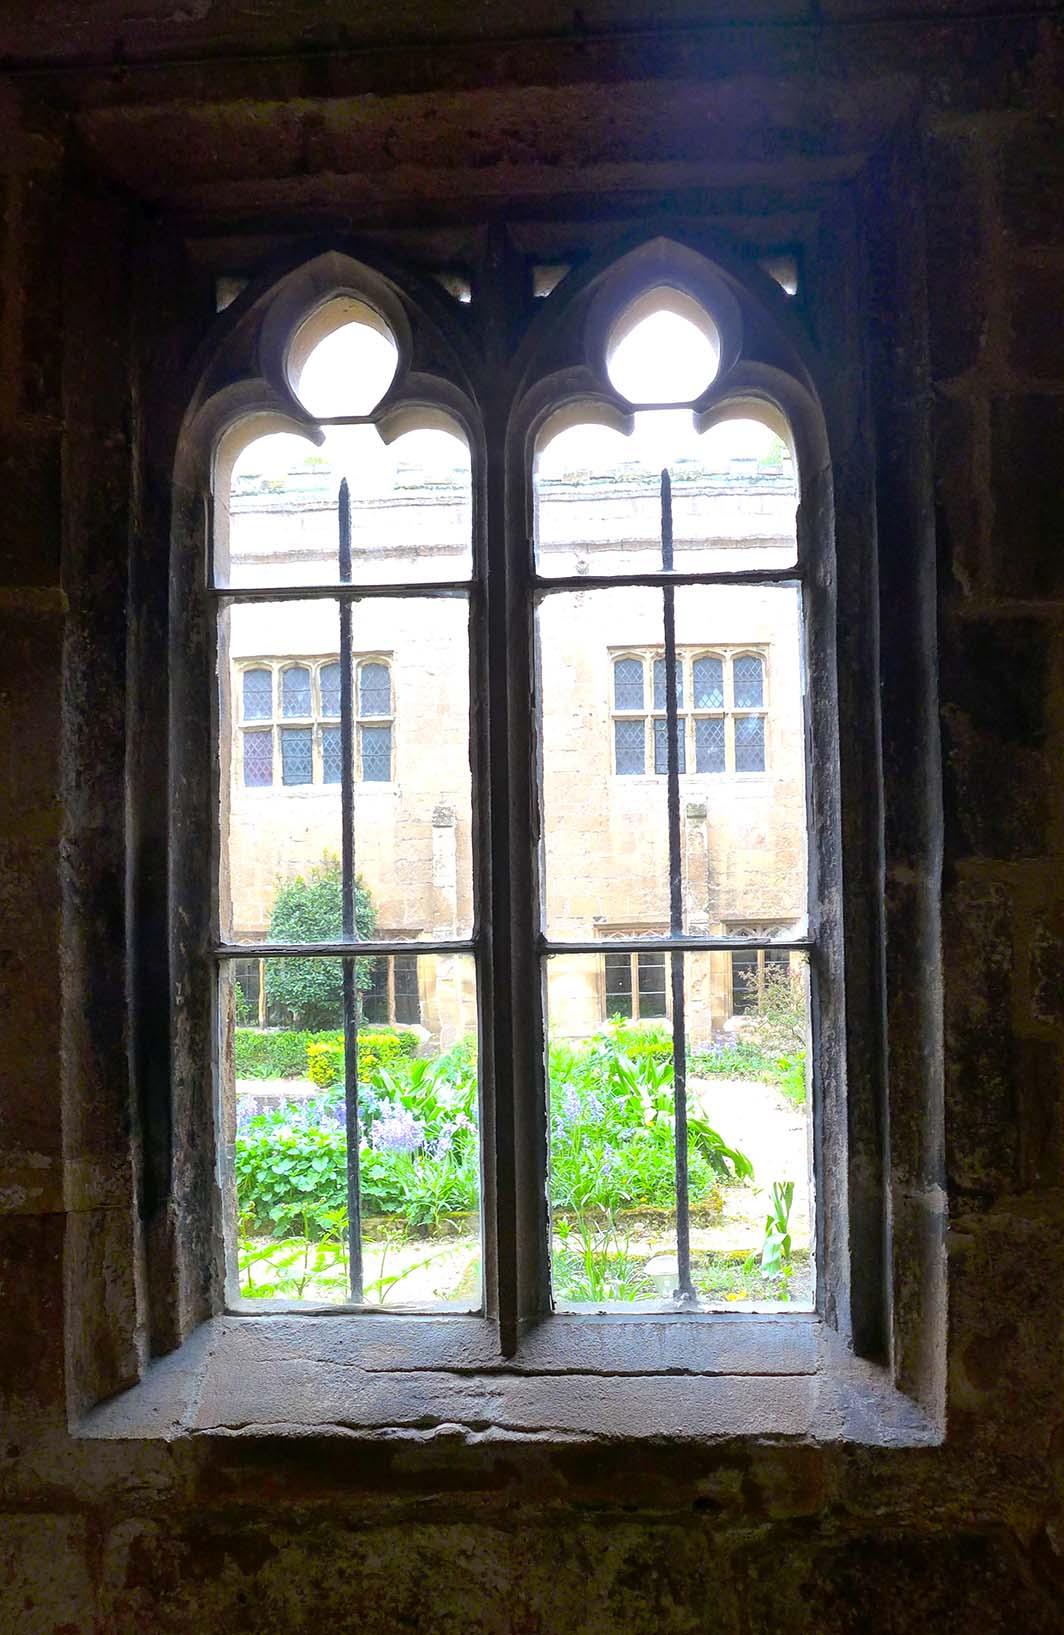 Visite chez Lord Byron, à Newstead Abbey